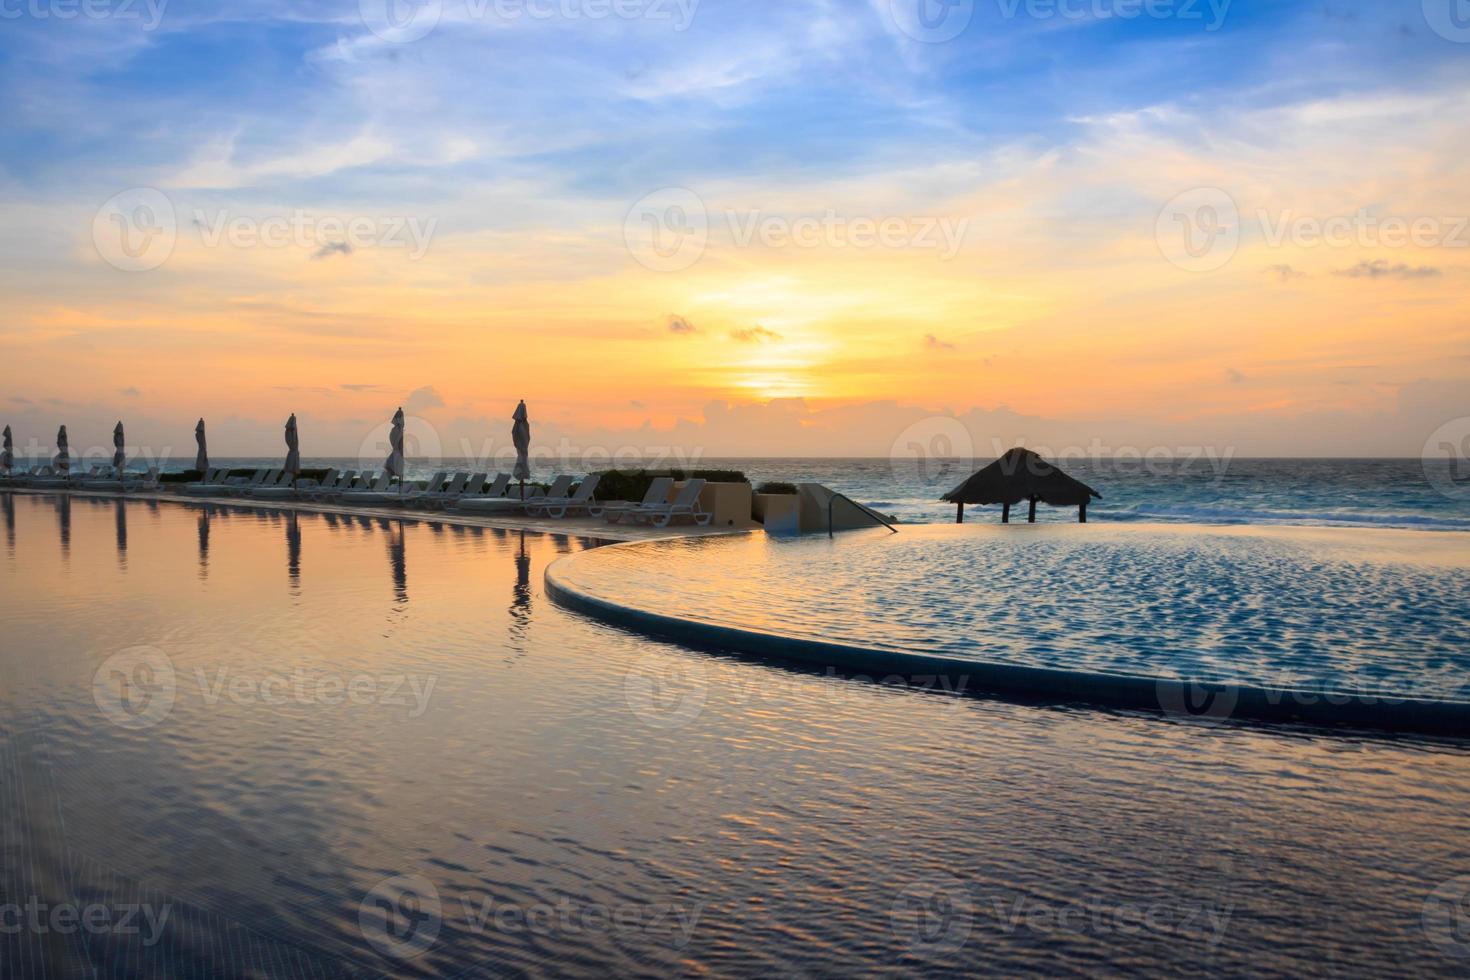 infinity pool bij zonsopgang foto